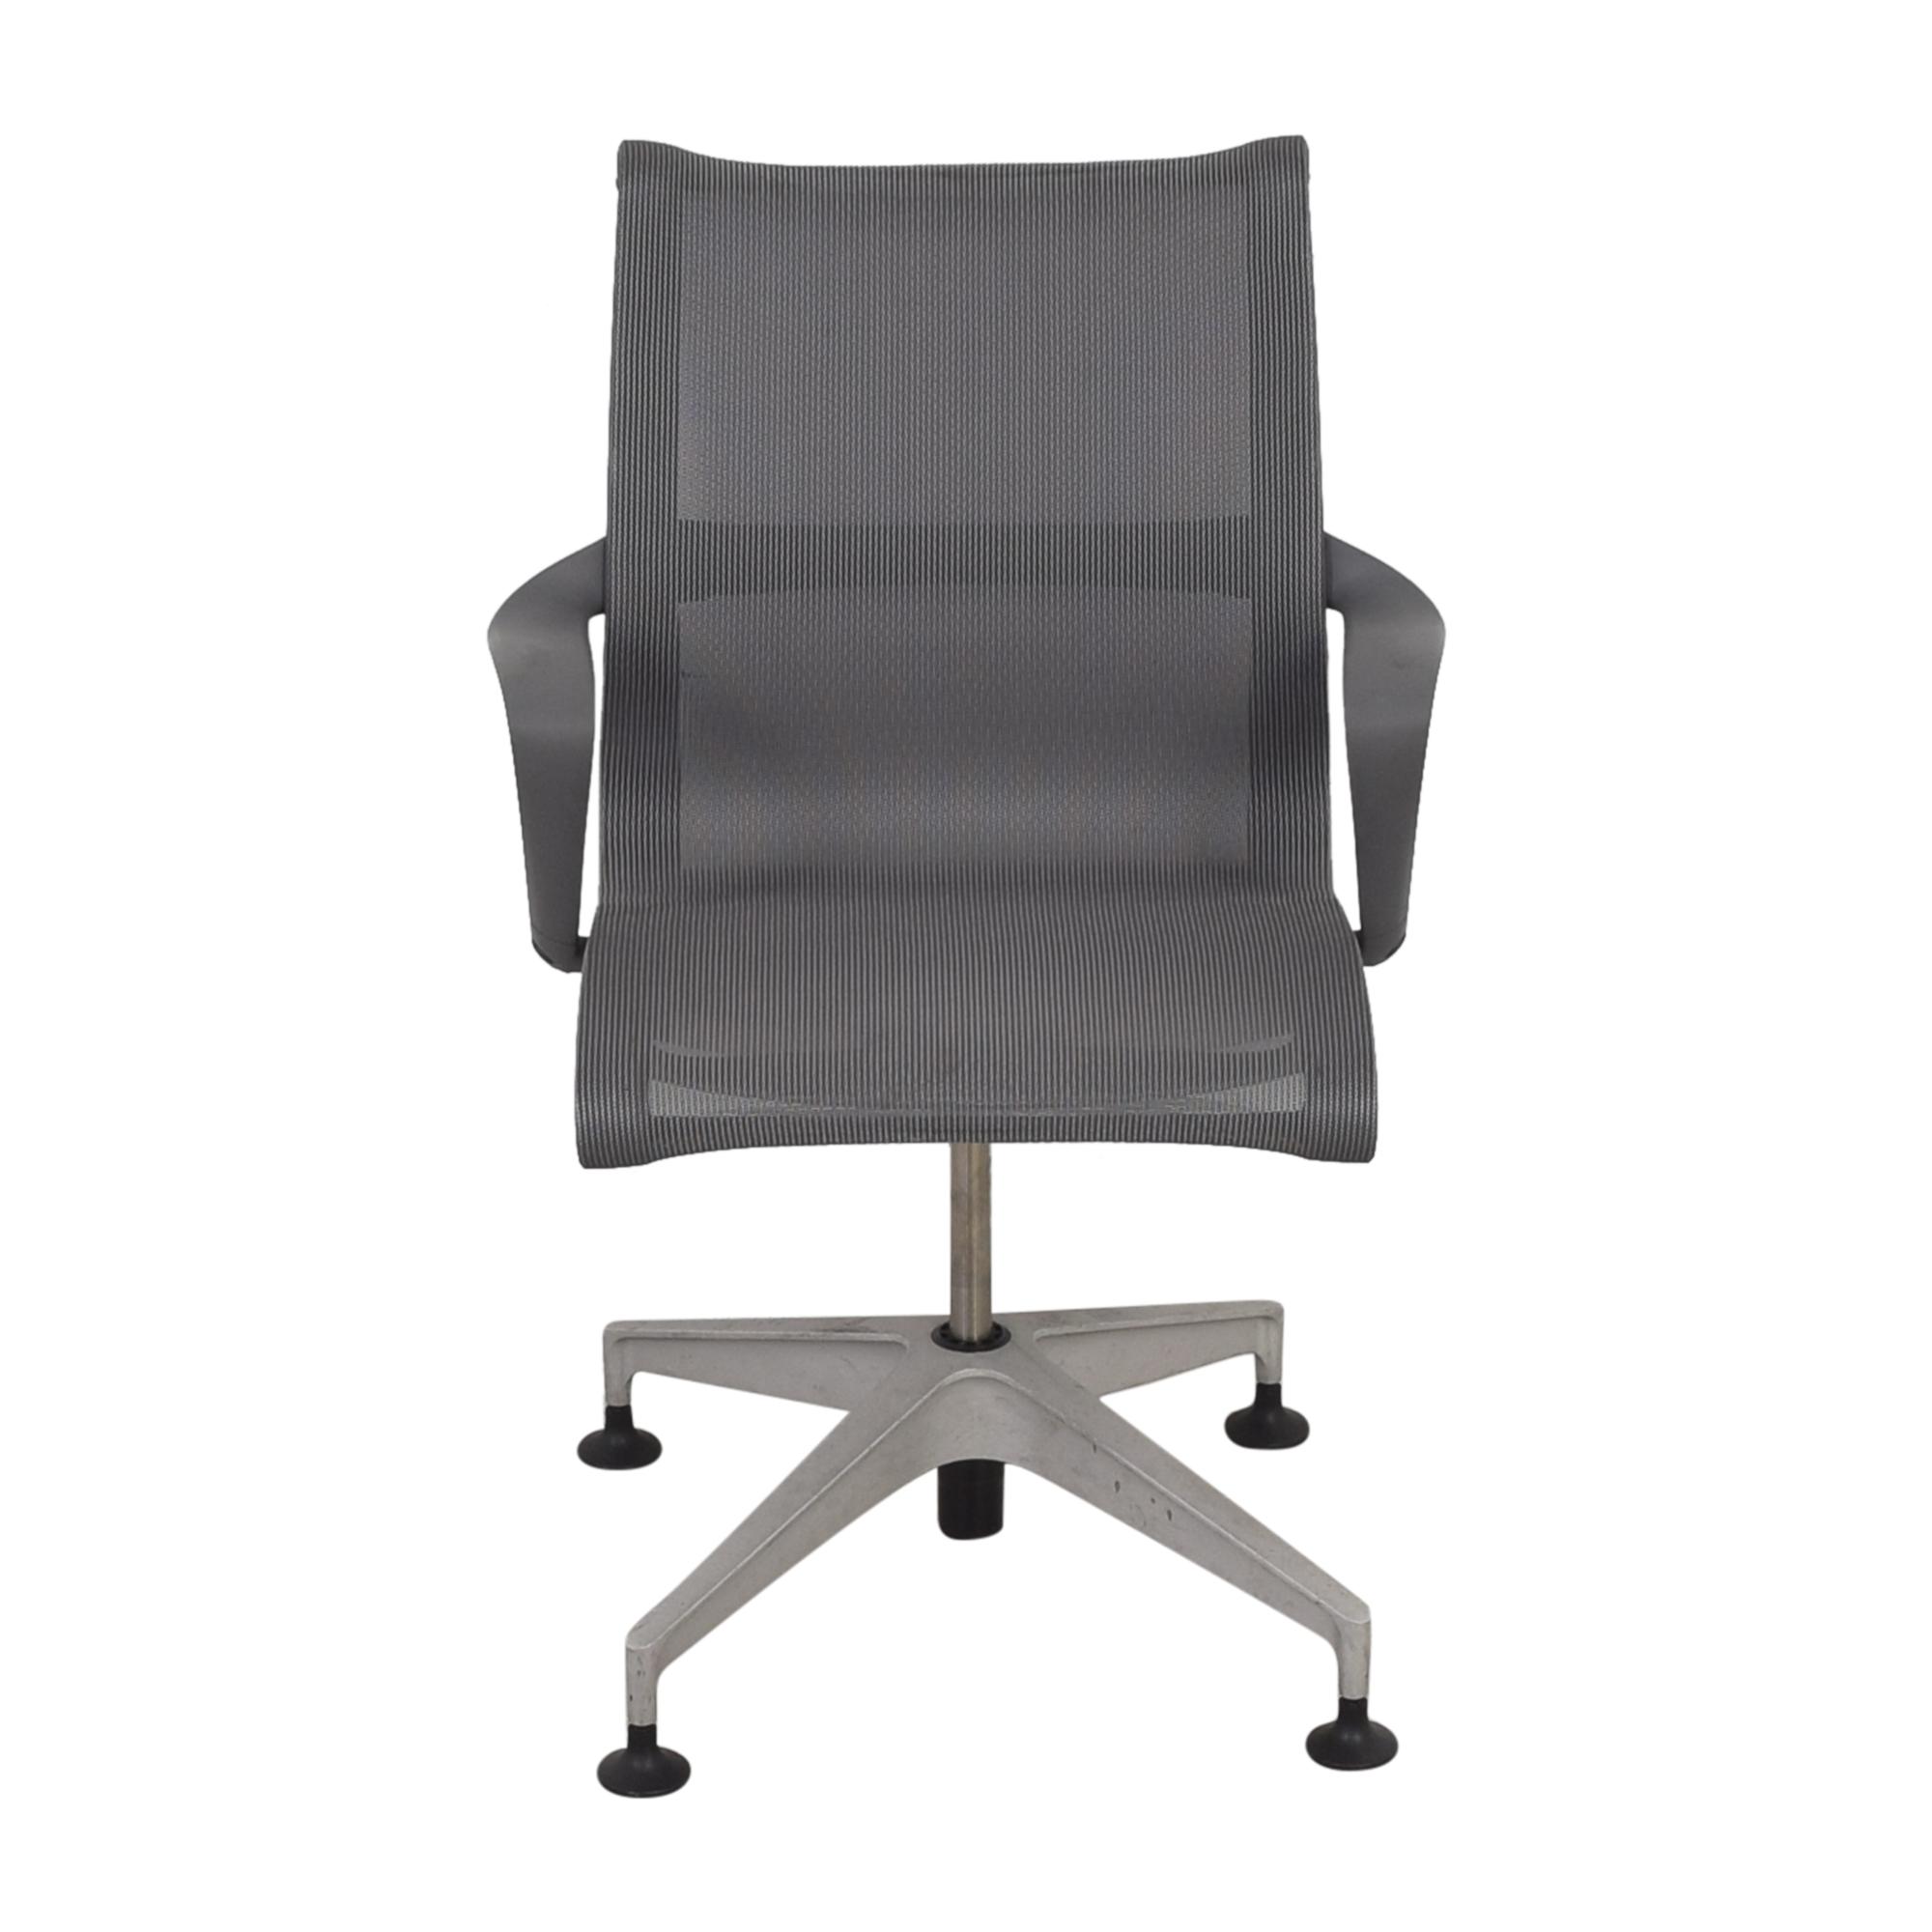 Herman Miller Herman Miller Setu Chair price